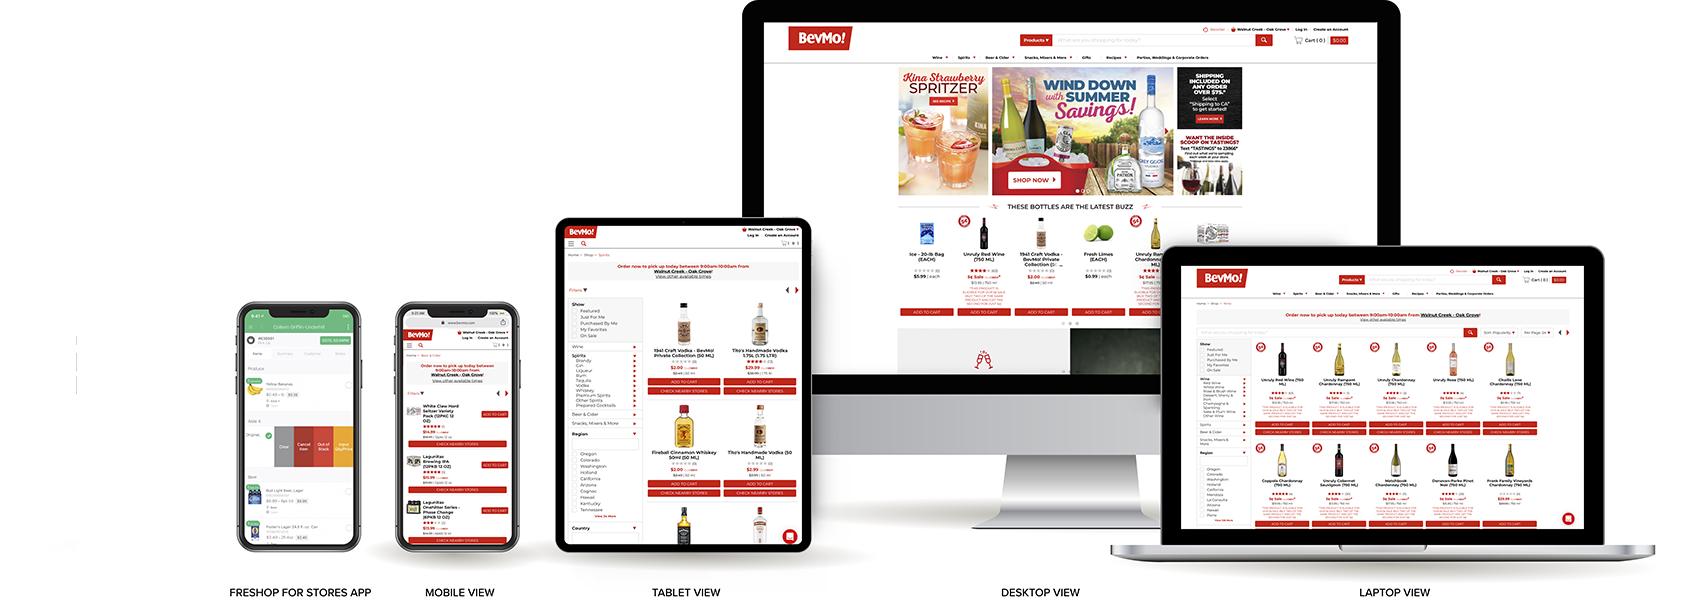 BEVMO-apple-mockups-2019-template-web